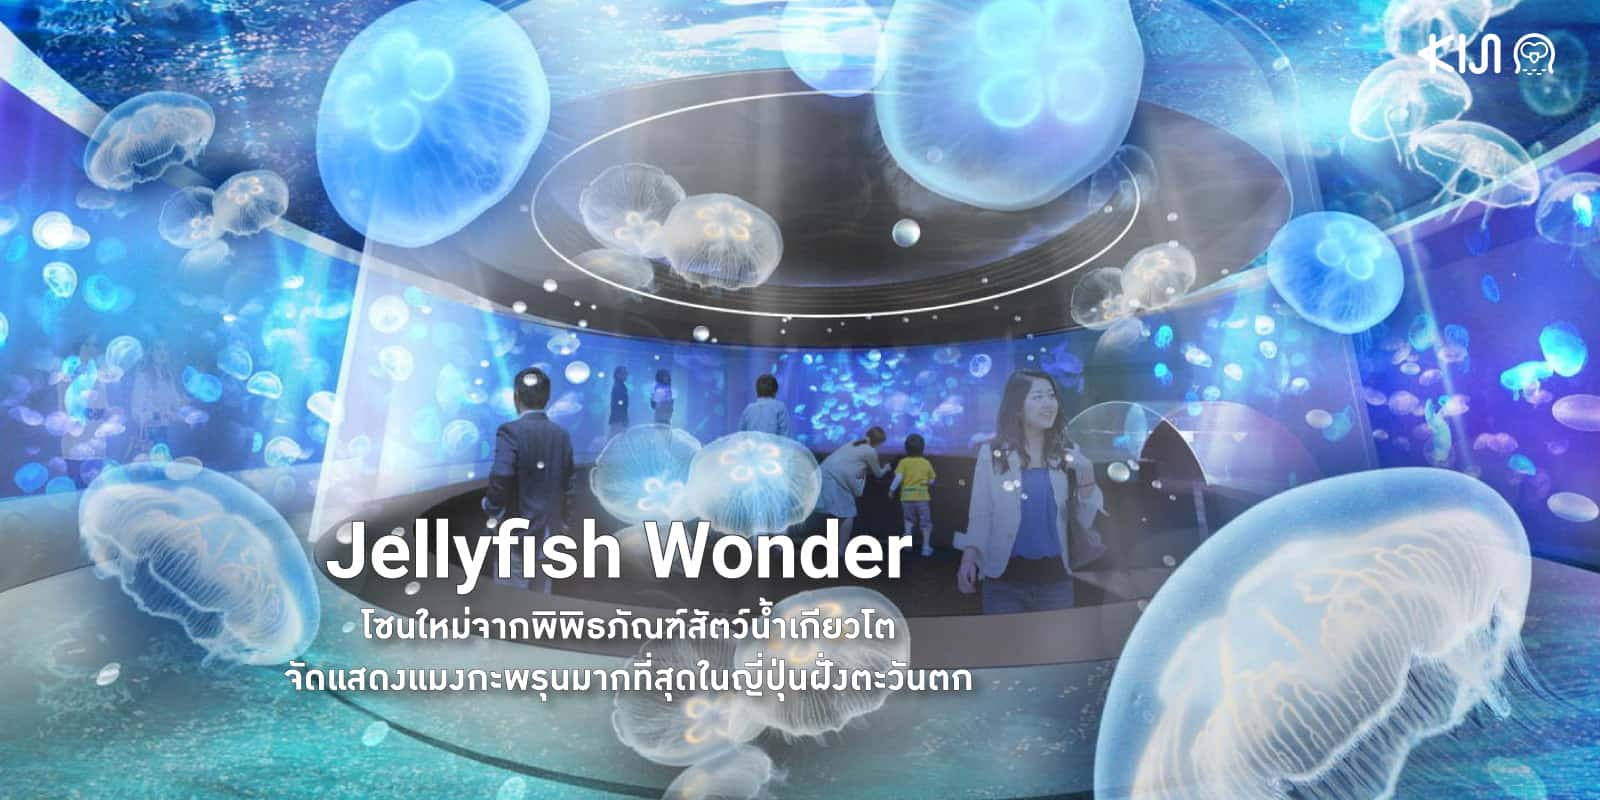 Jelly Wonder โซนแมงกะพรุนใหม่จาก Kyoto Aquarium